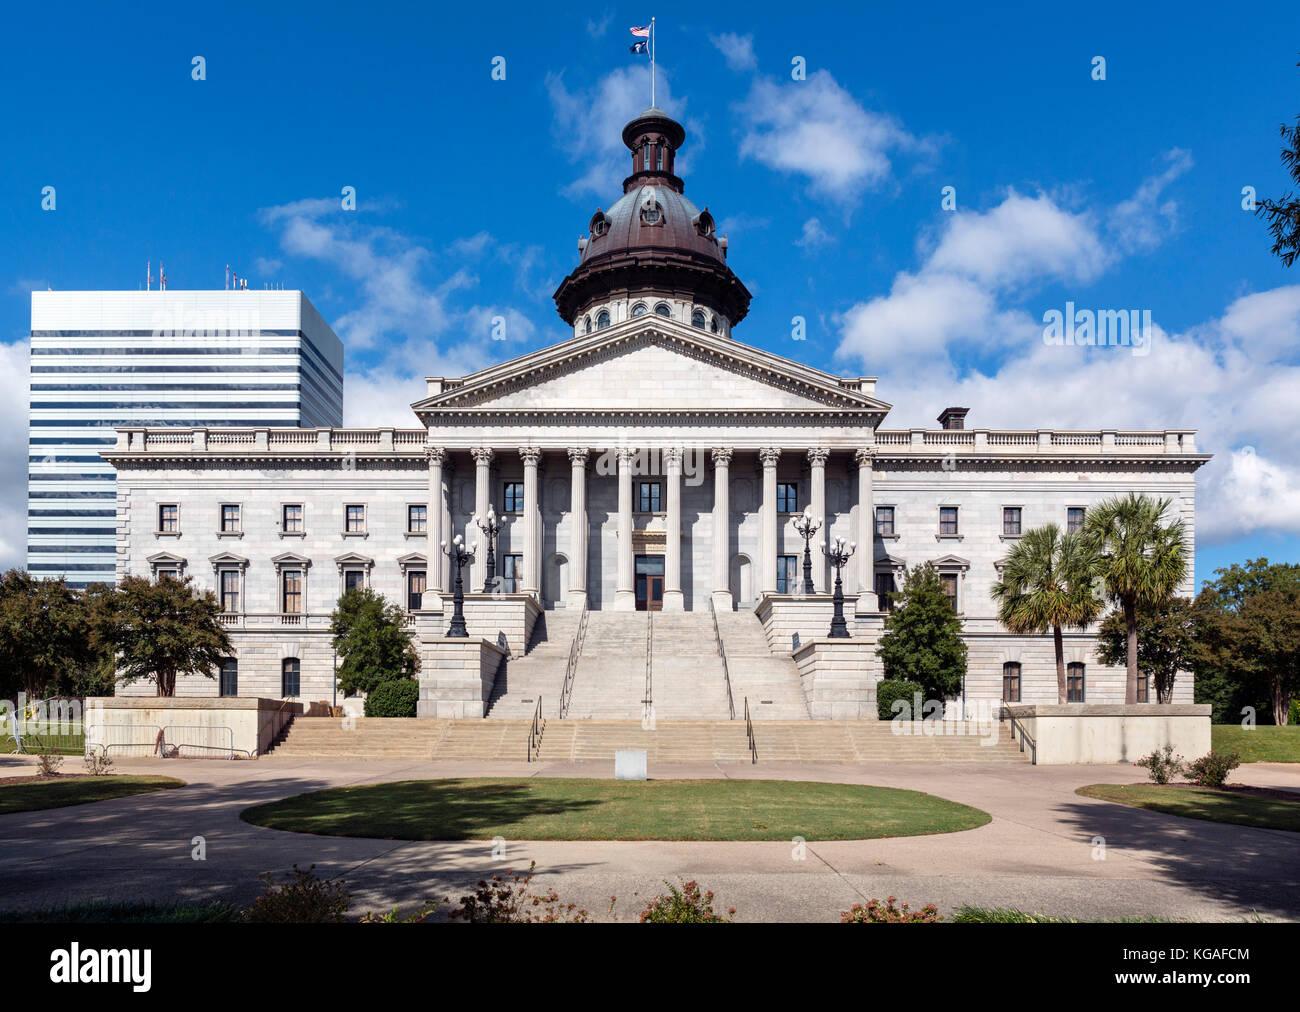 South carolina state capitol building stock photos south for The carolina house